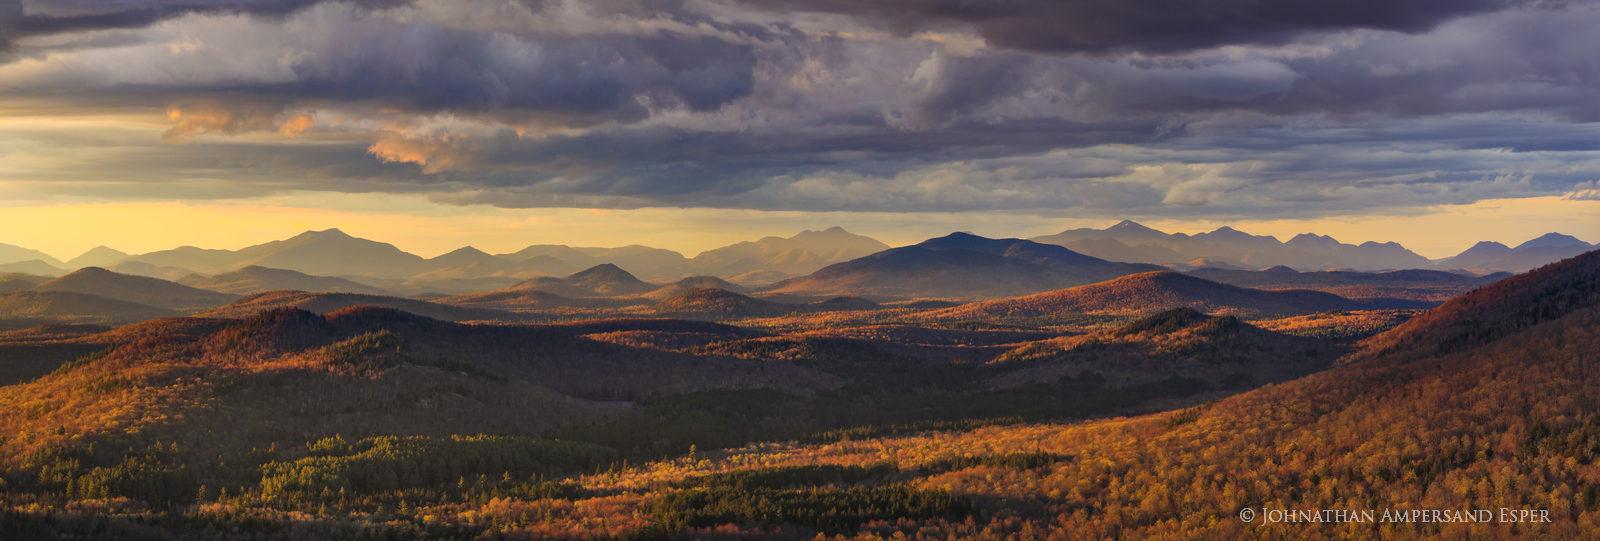 Chimney Mountain,Chimney Mt,central Adirondacks,Adirondack Mountains,May,2019,spring,sunset,sunset light,summit,rocks,panorama...